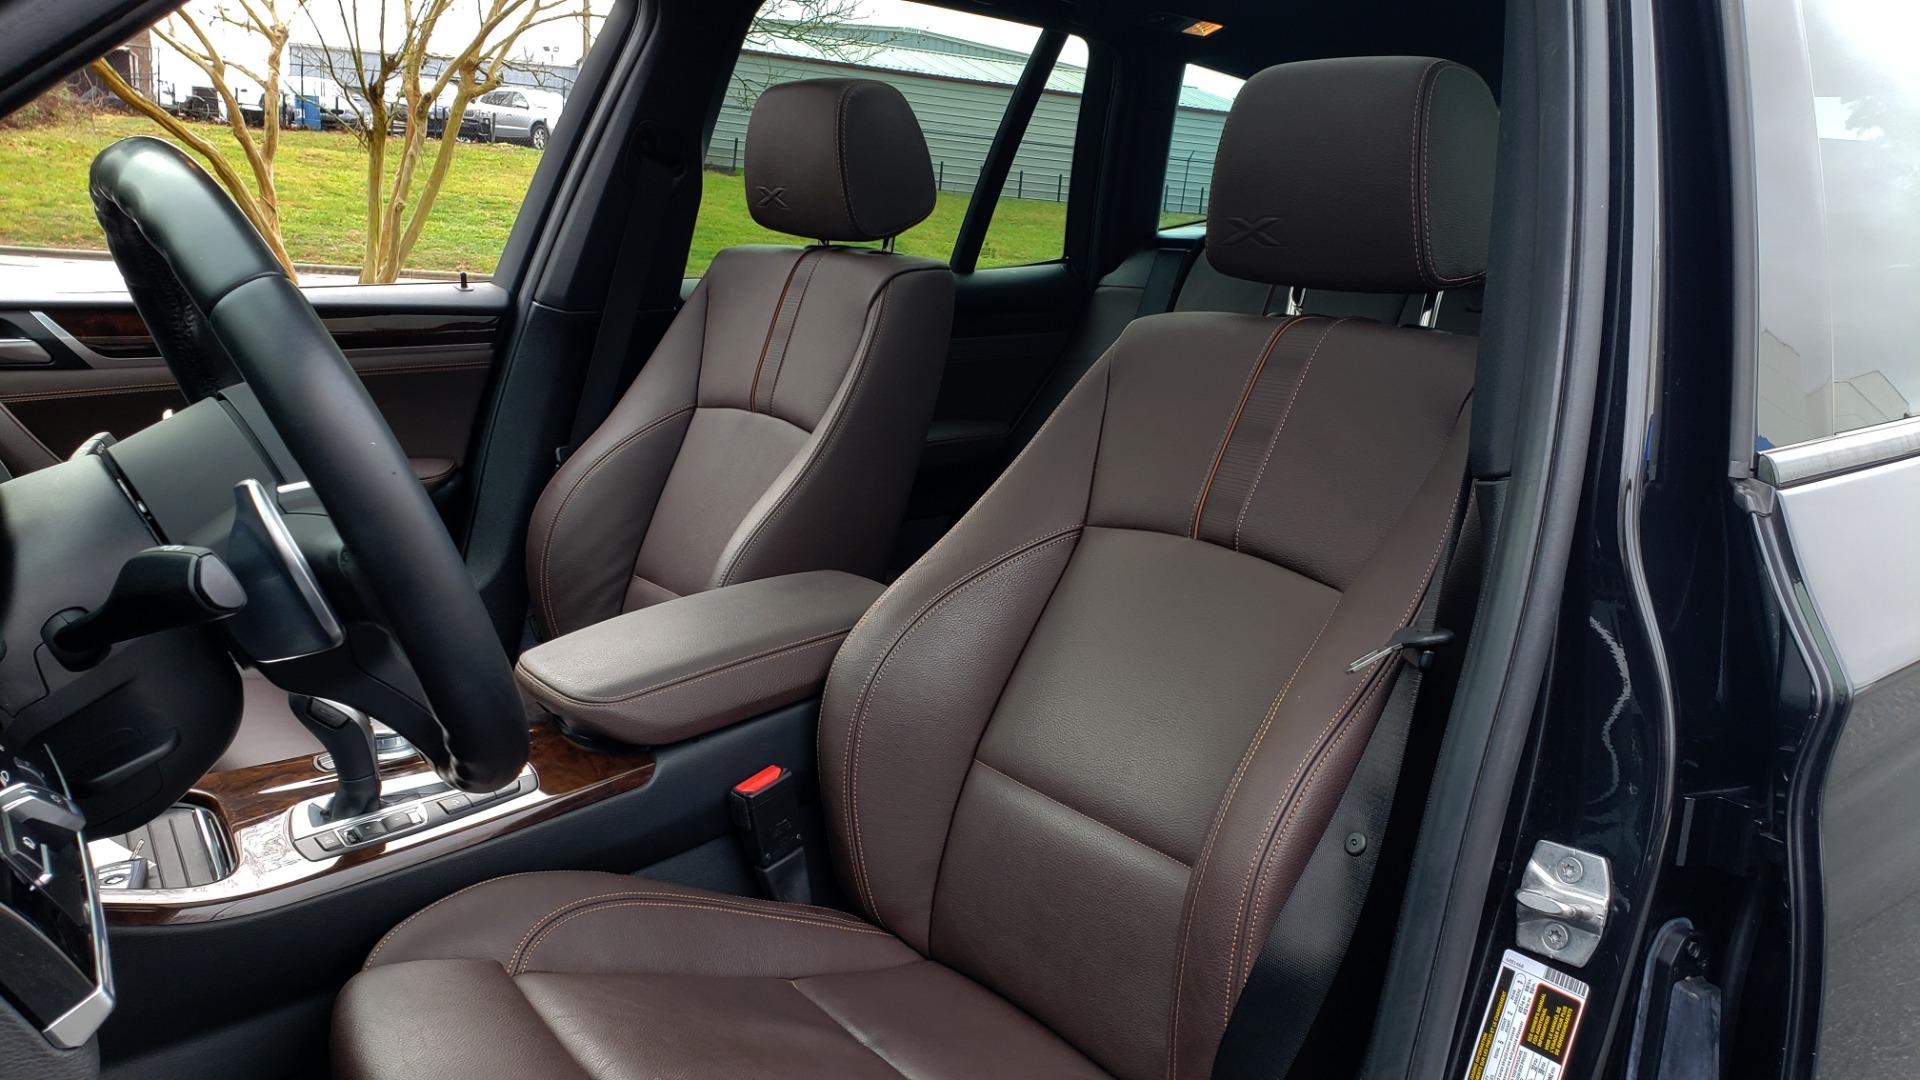 Used 2017 BMW X3 XDRIVE35I M-SPORT / DRVR ASST PLUS / TECHNOLOGY / HUD / BLIND SPOT for sale Sold at Formula Imports in Charlotte NC 28227 34